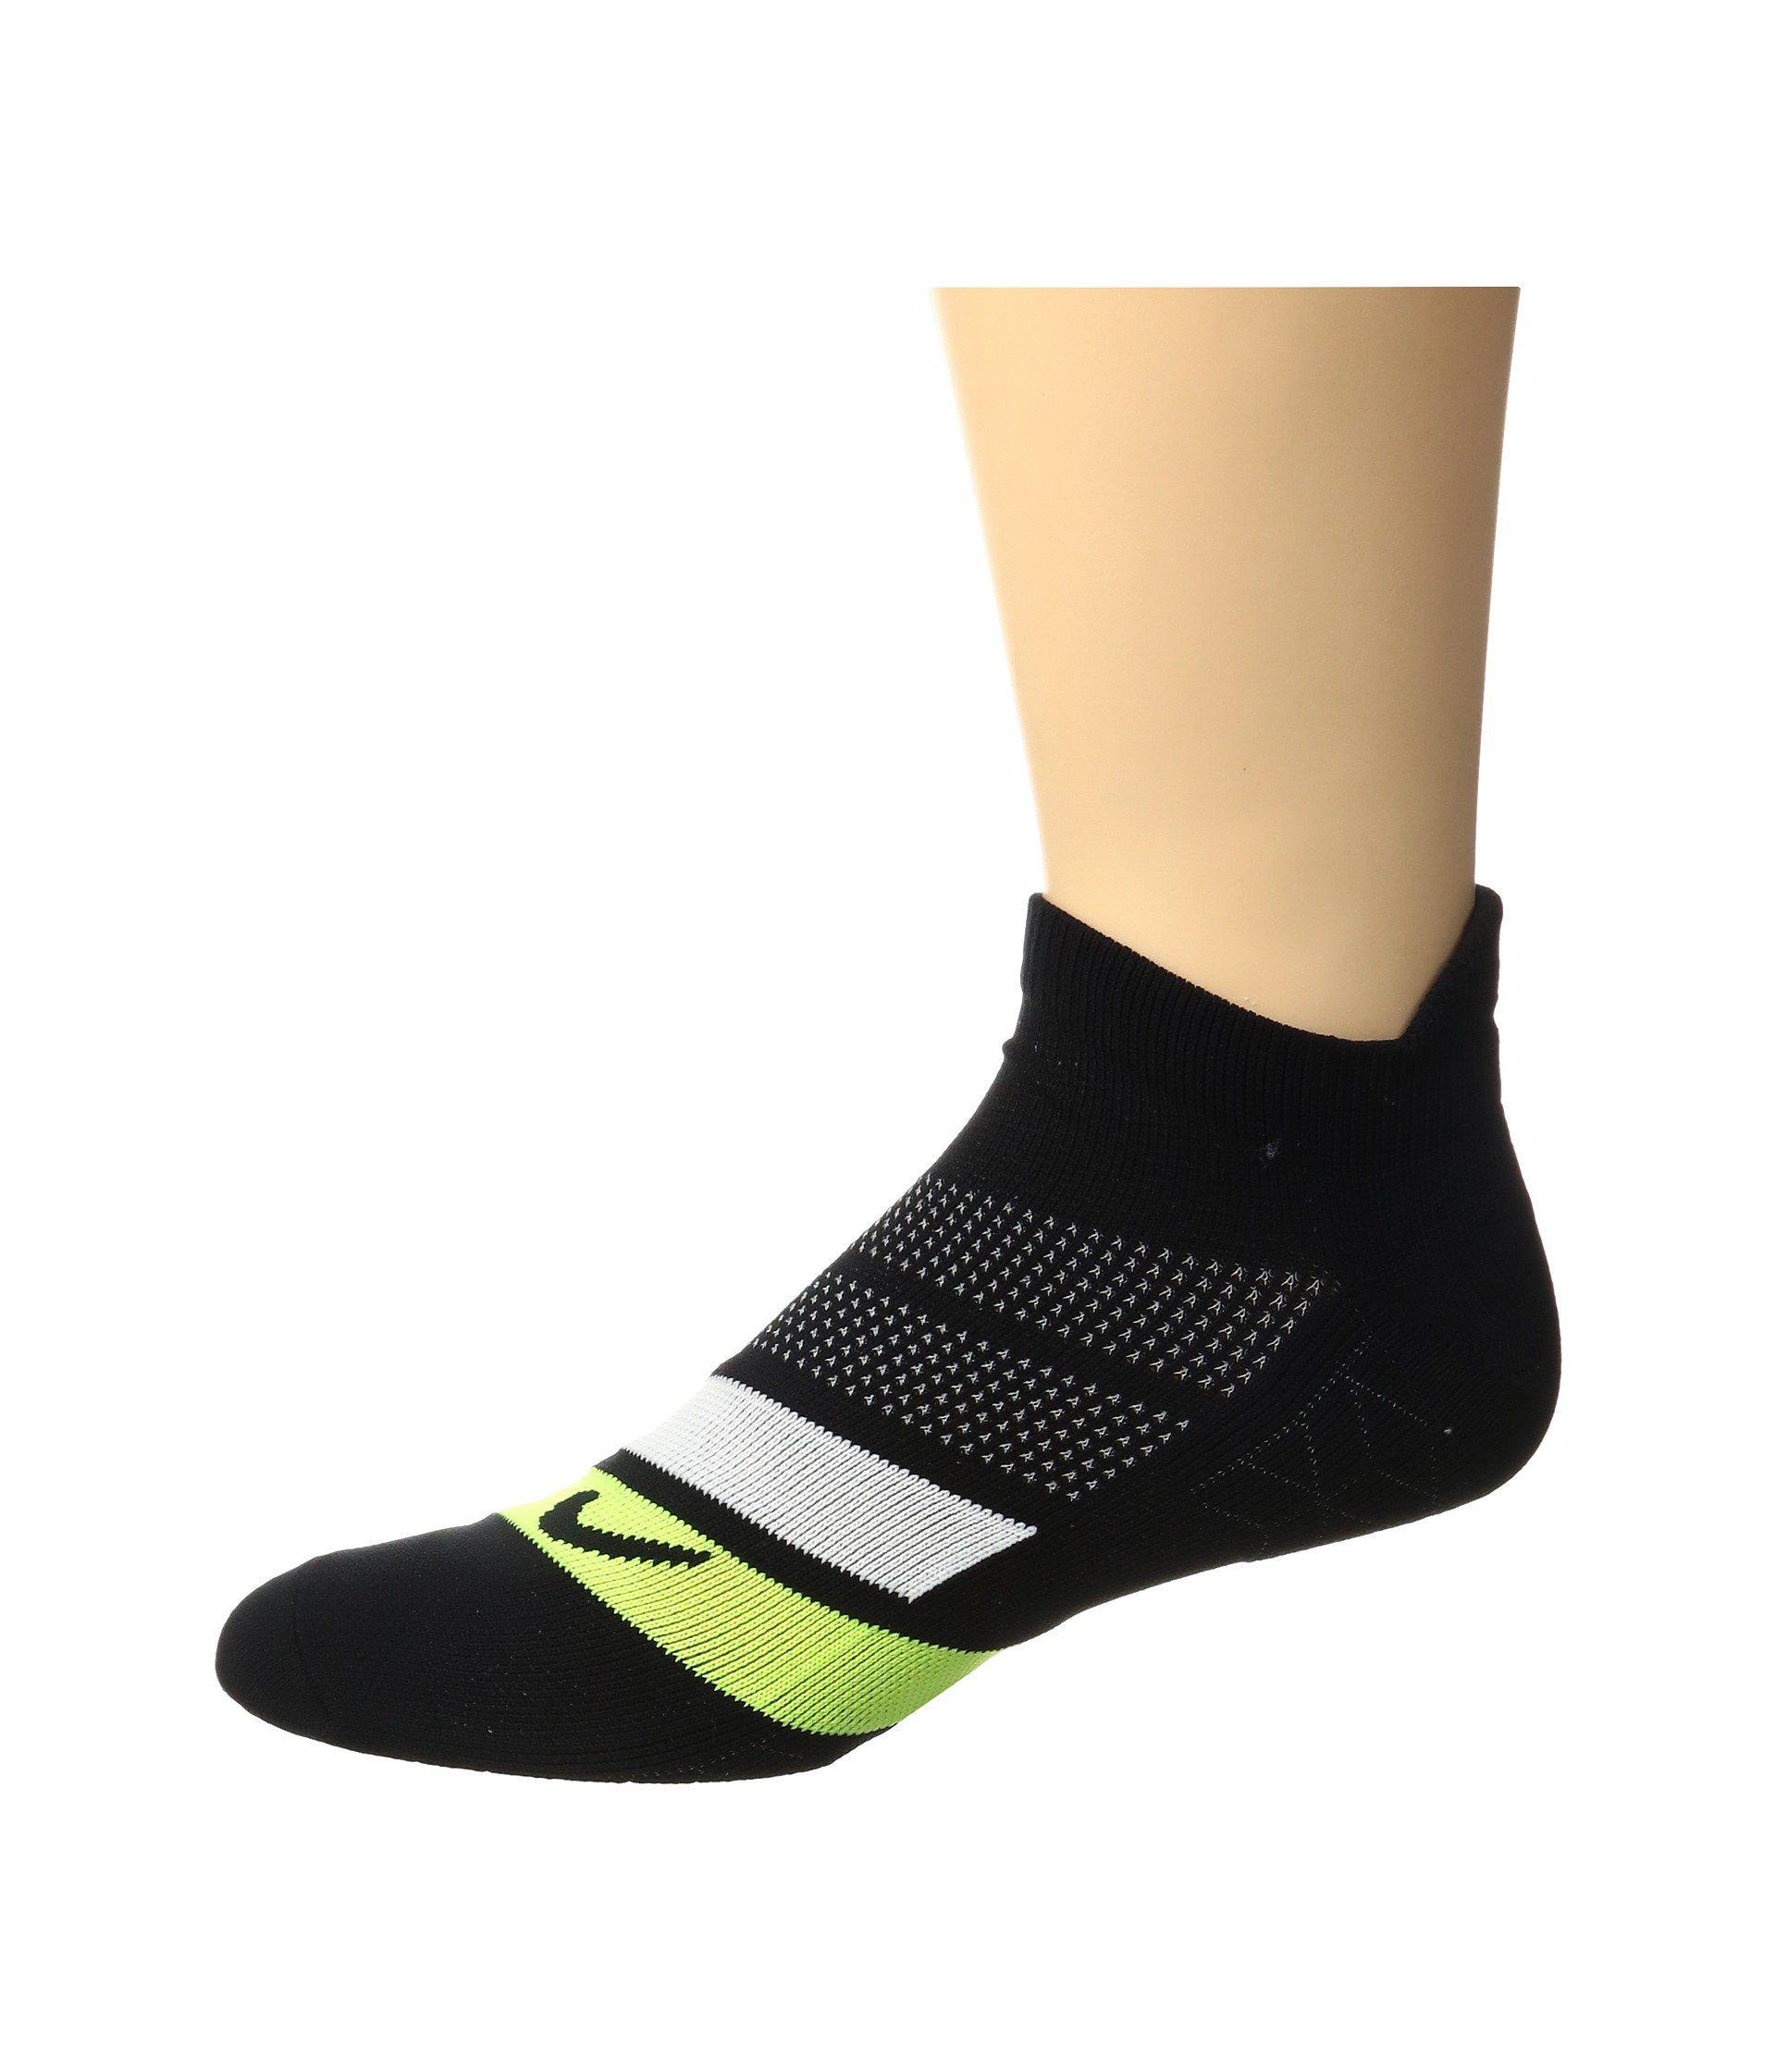 100% authentic b31f5 7ab37 Nike. Women s Dri-fit Cushion Dynamic Arch No-show Running Socks ...